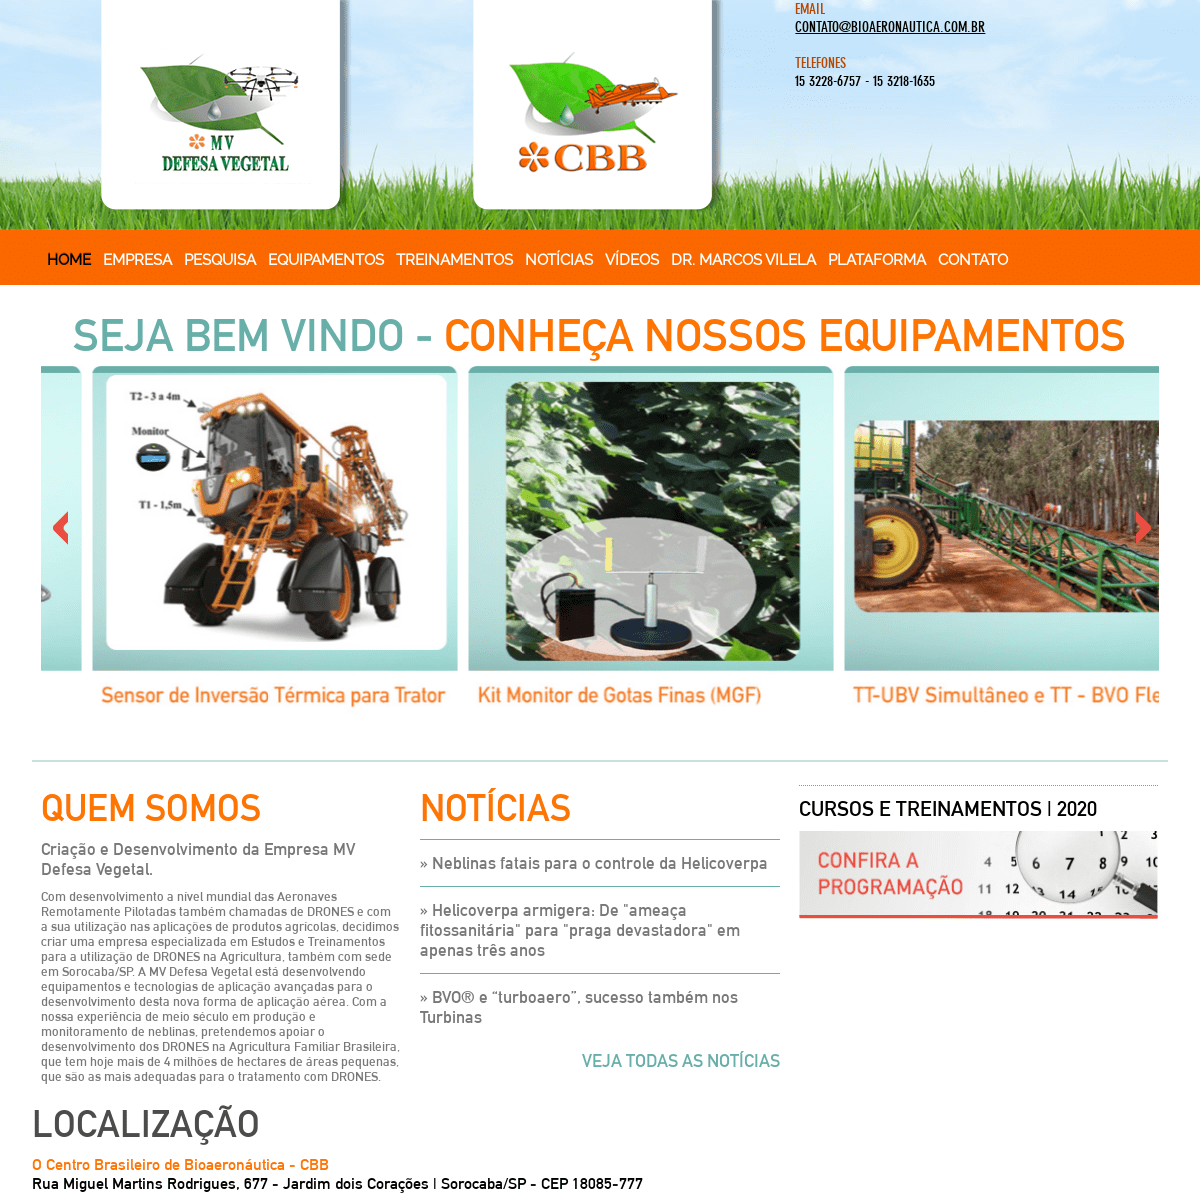 Centro Brasileiro de Bioaeronáutica